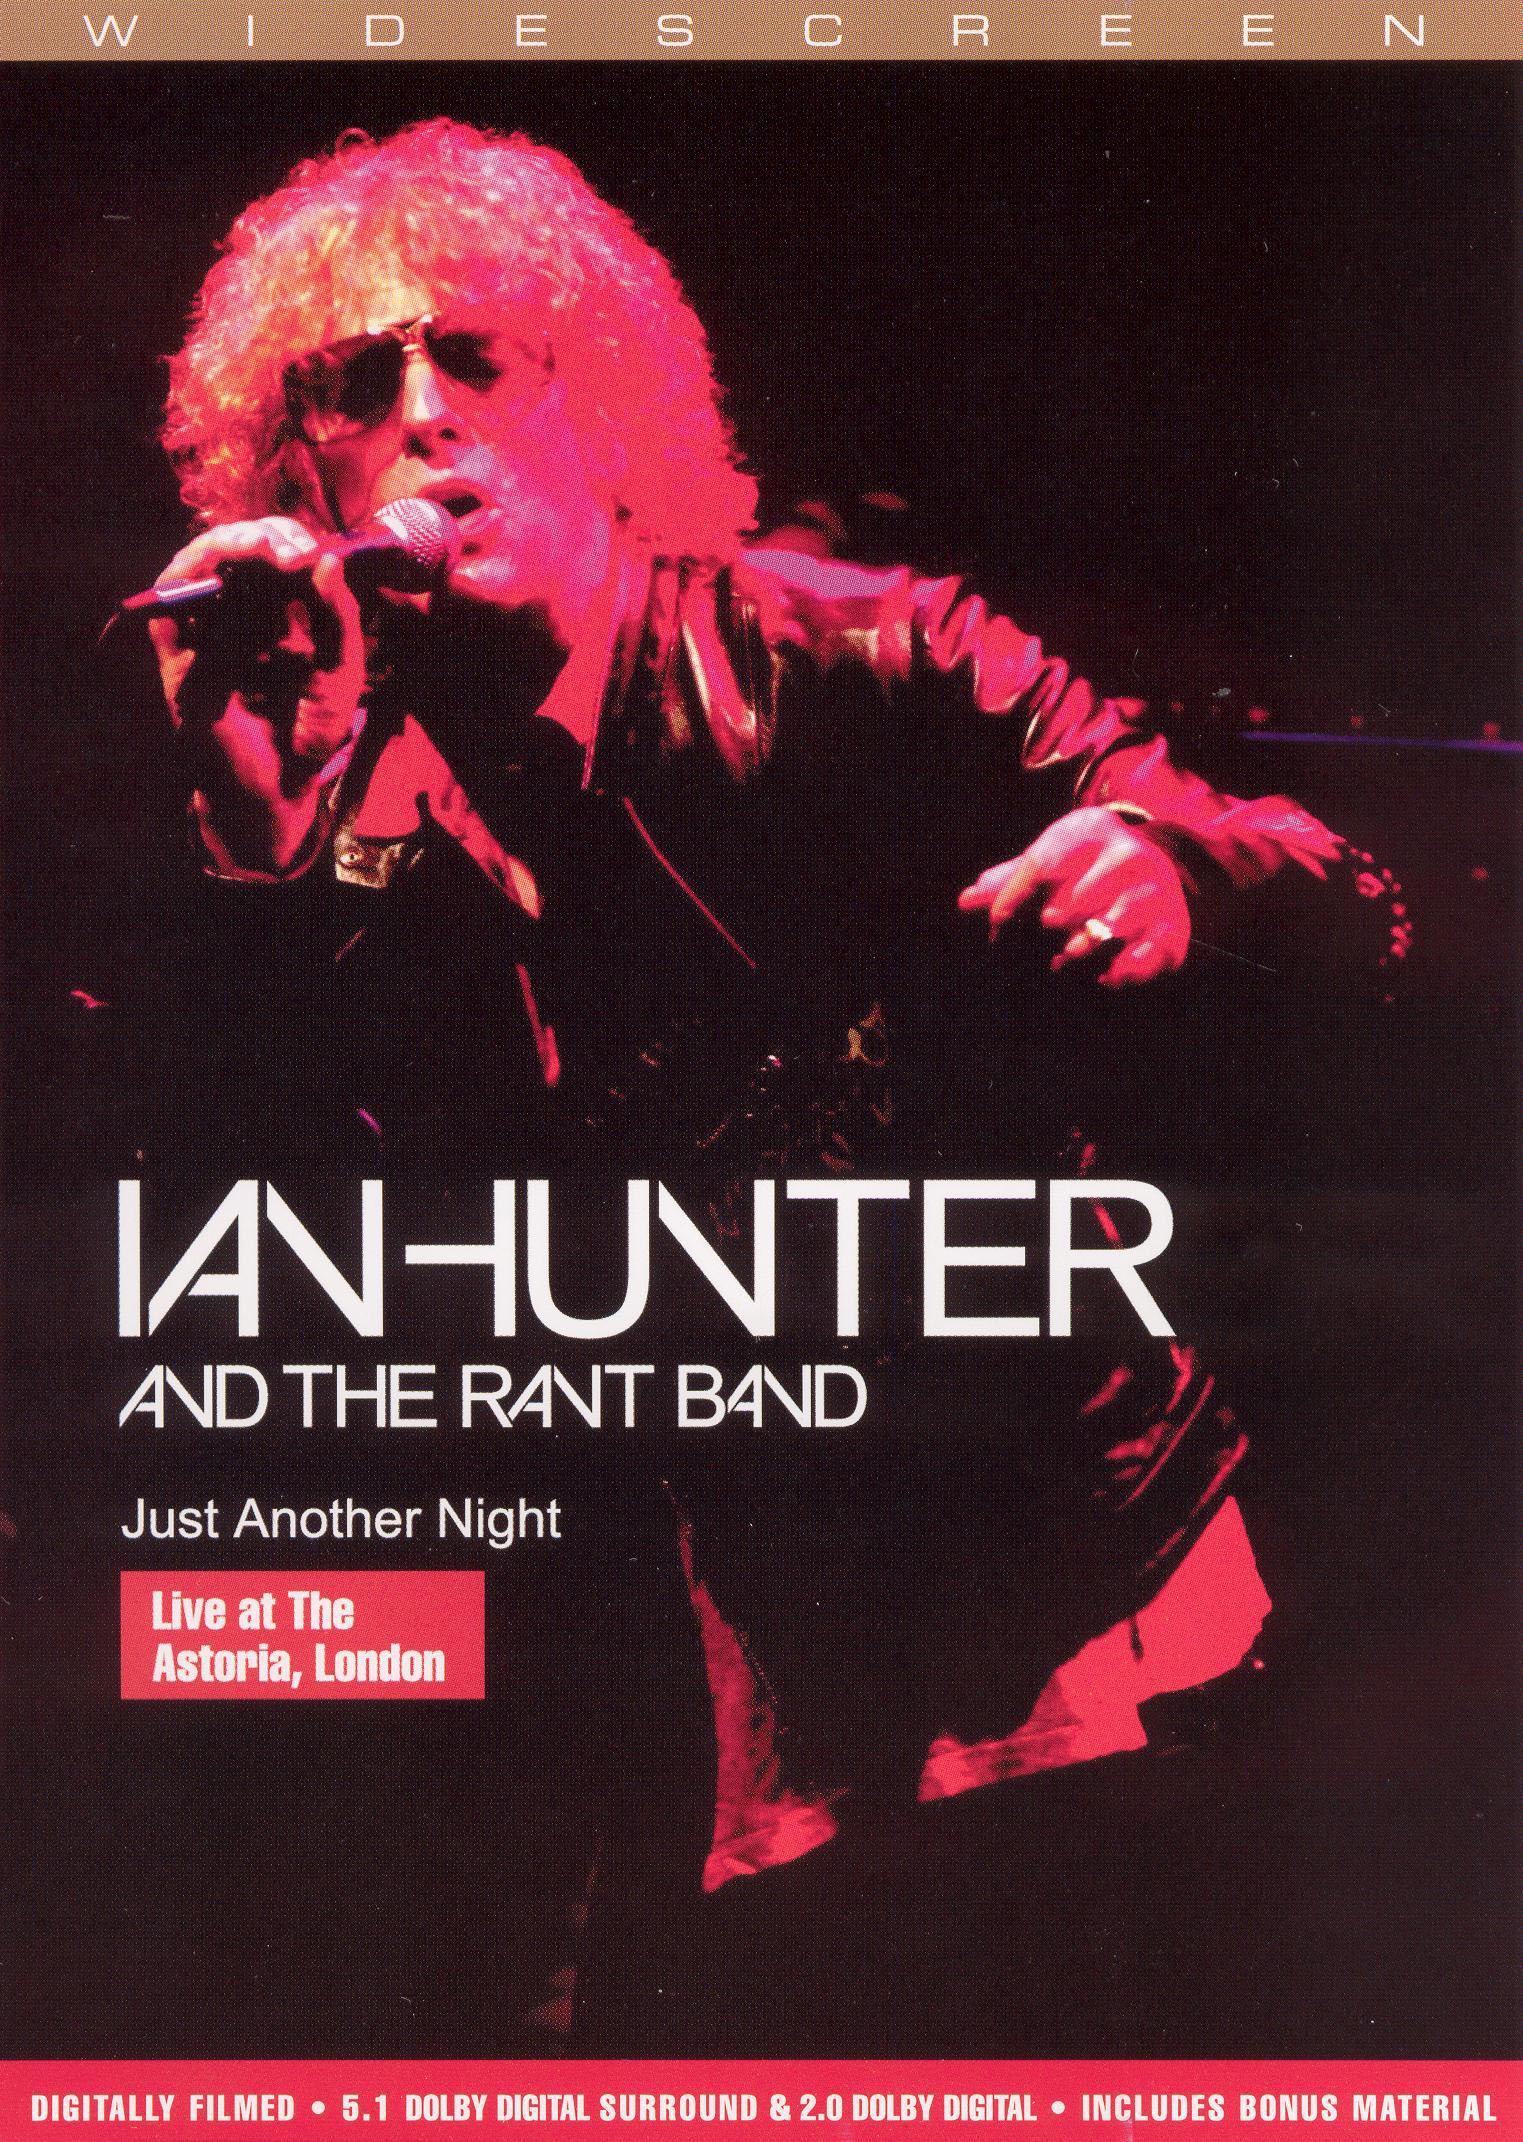 Ian Hunter: Just Another Night: Live at Astoria